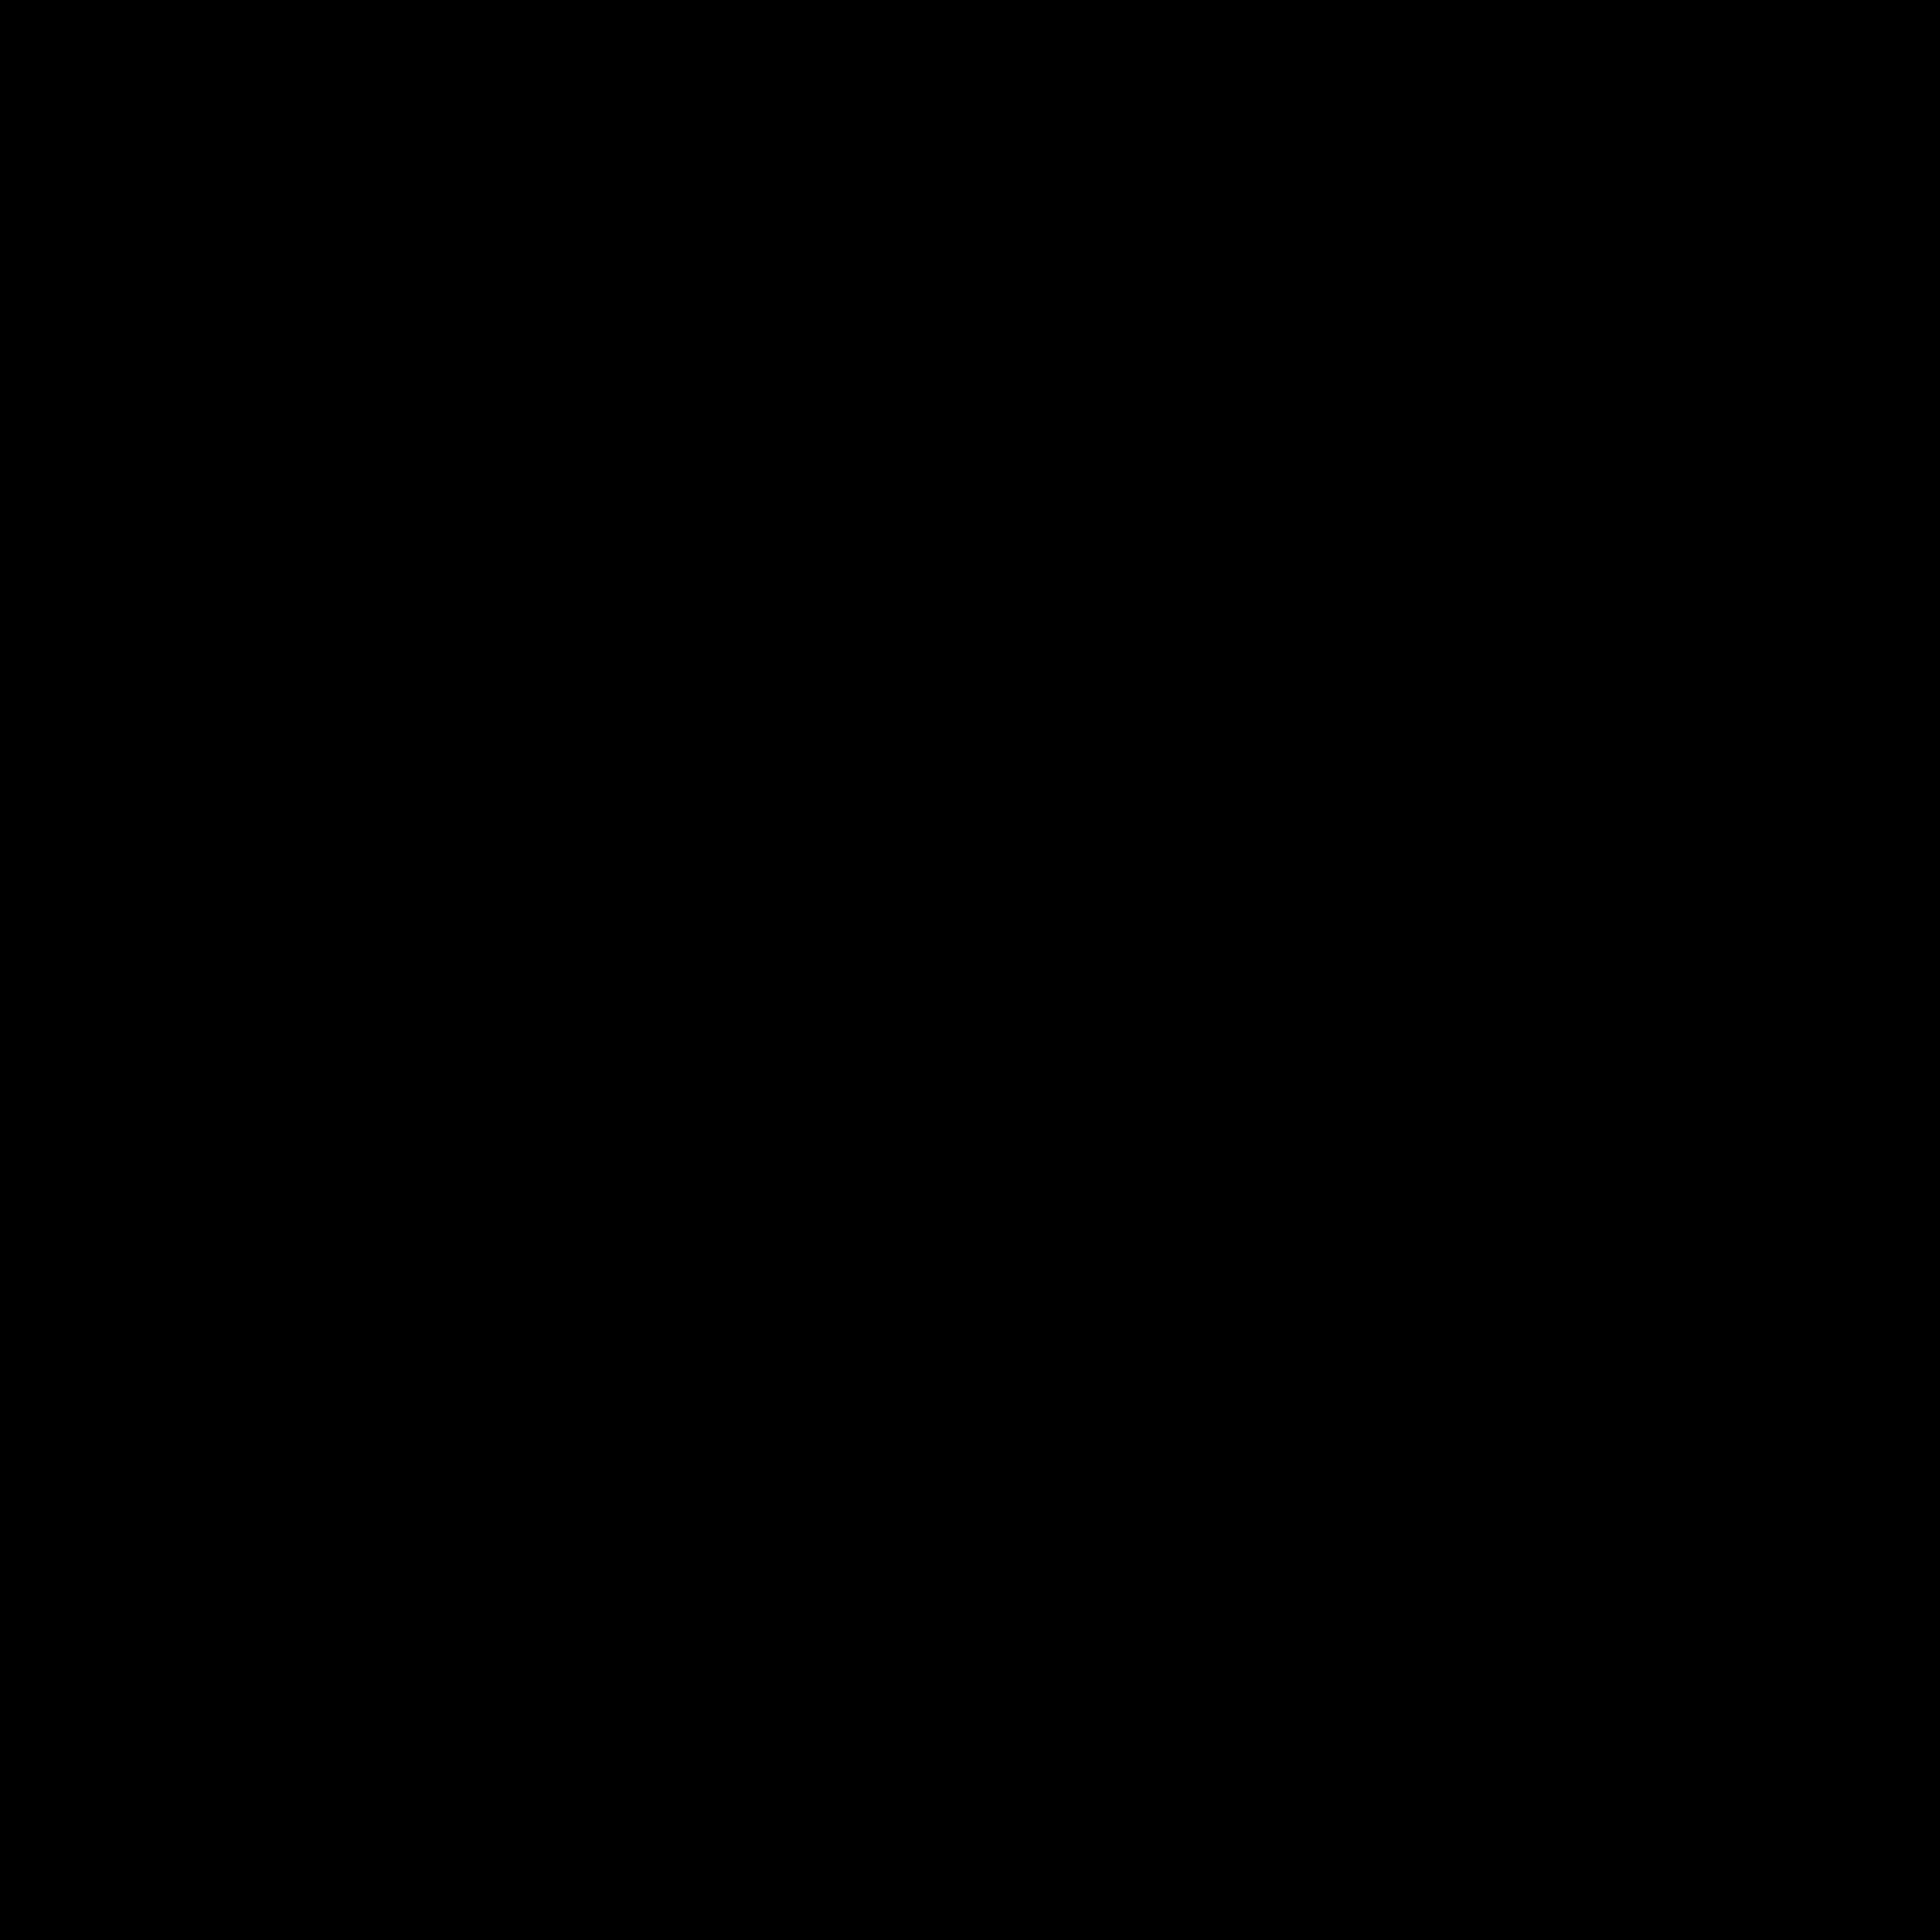 pearl logo 0 - Pearl Drums Logo